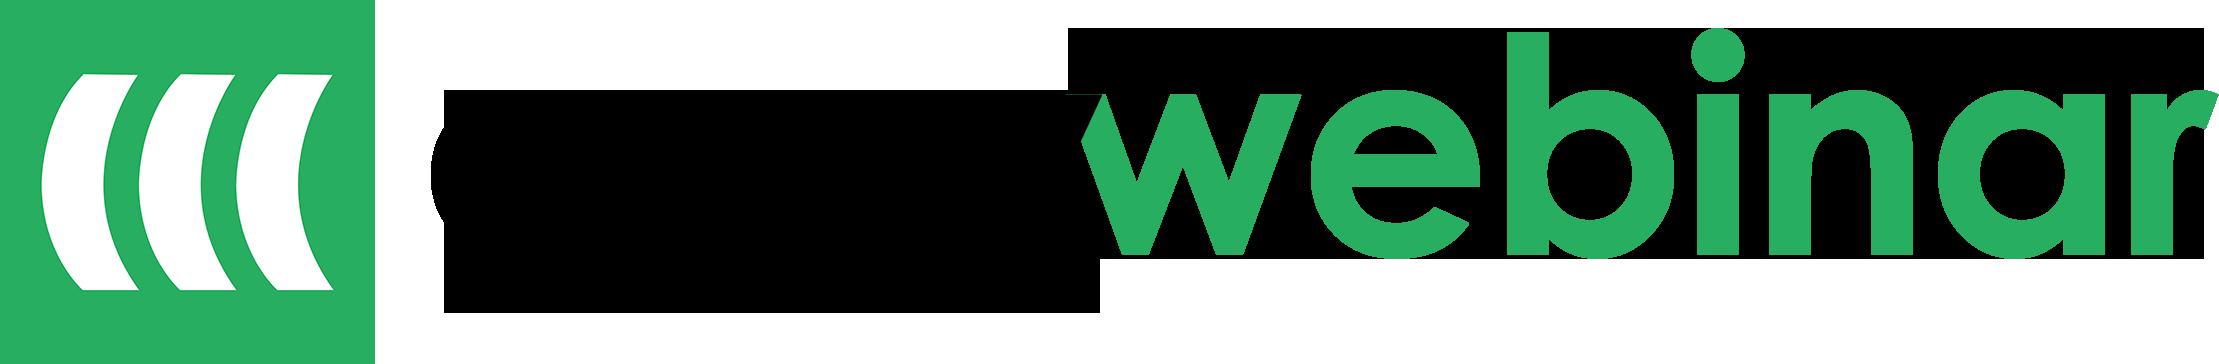 EasyWebinar Webinar Software